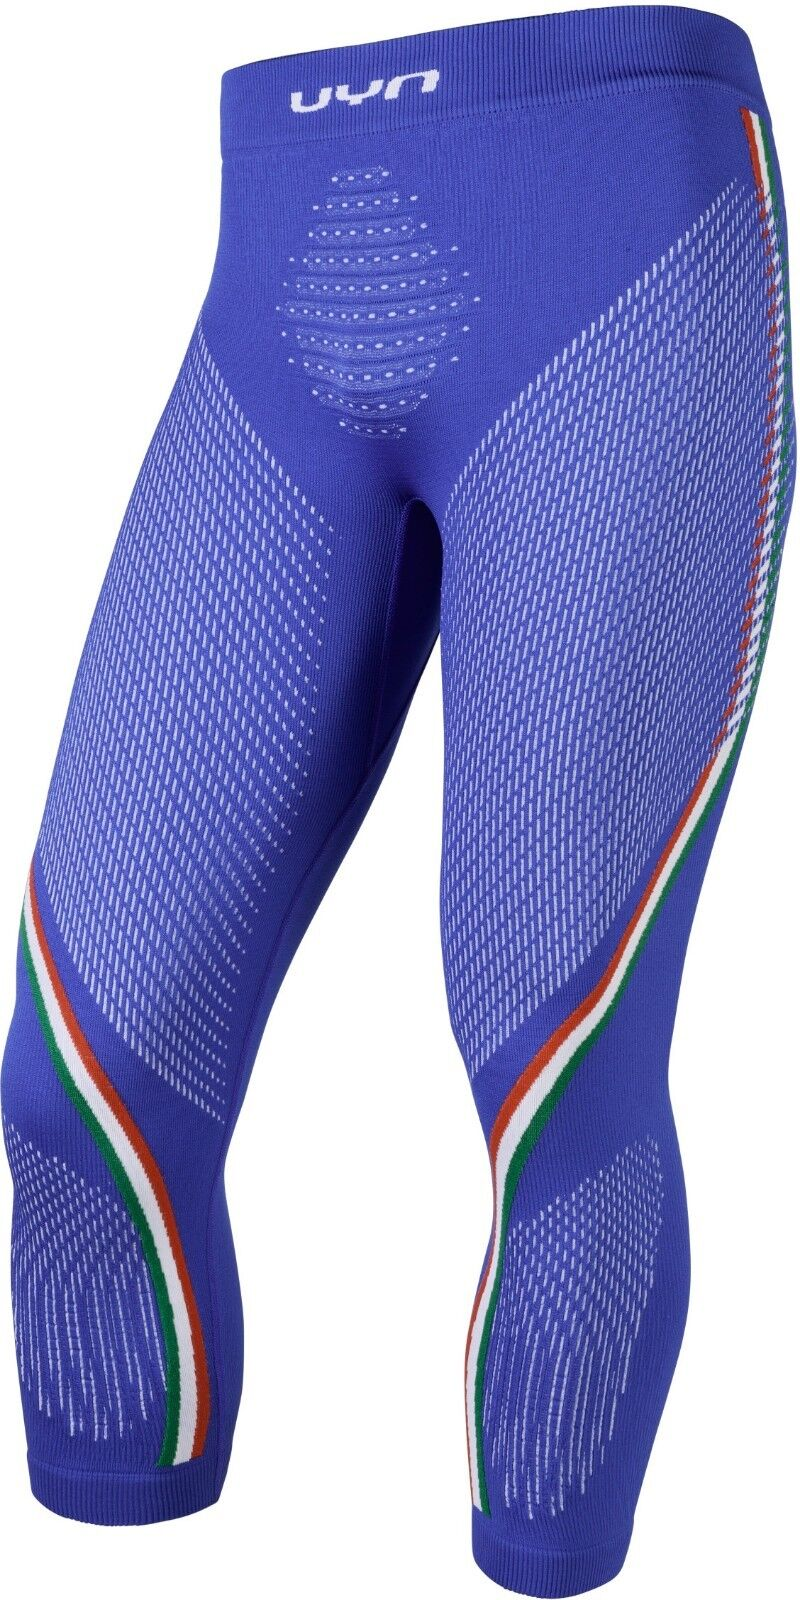 UYN - Natyon  Baselayer Pants Medium - Intimo Tecnico -  - U100022 T035  ¡no ser extrañado!